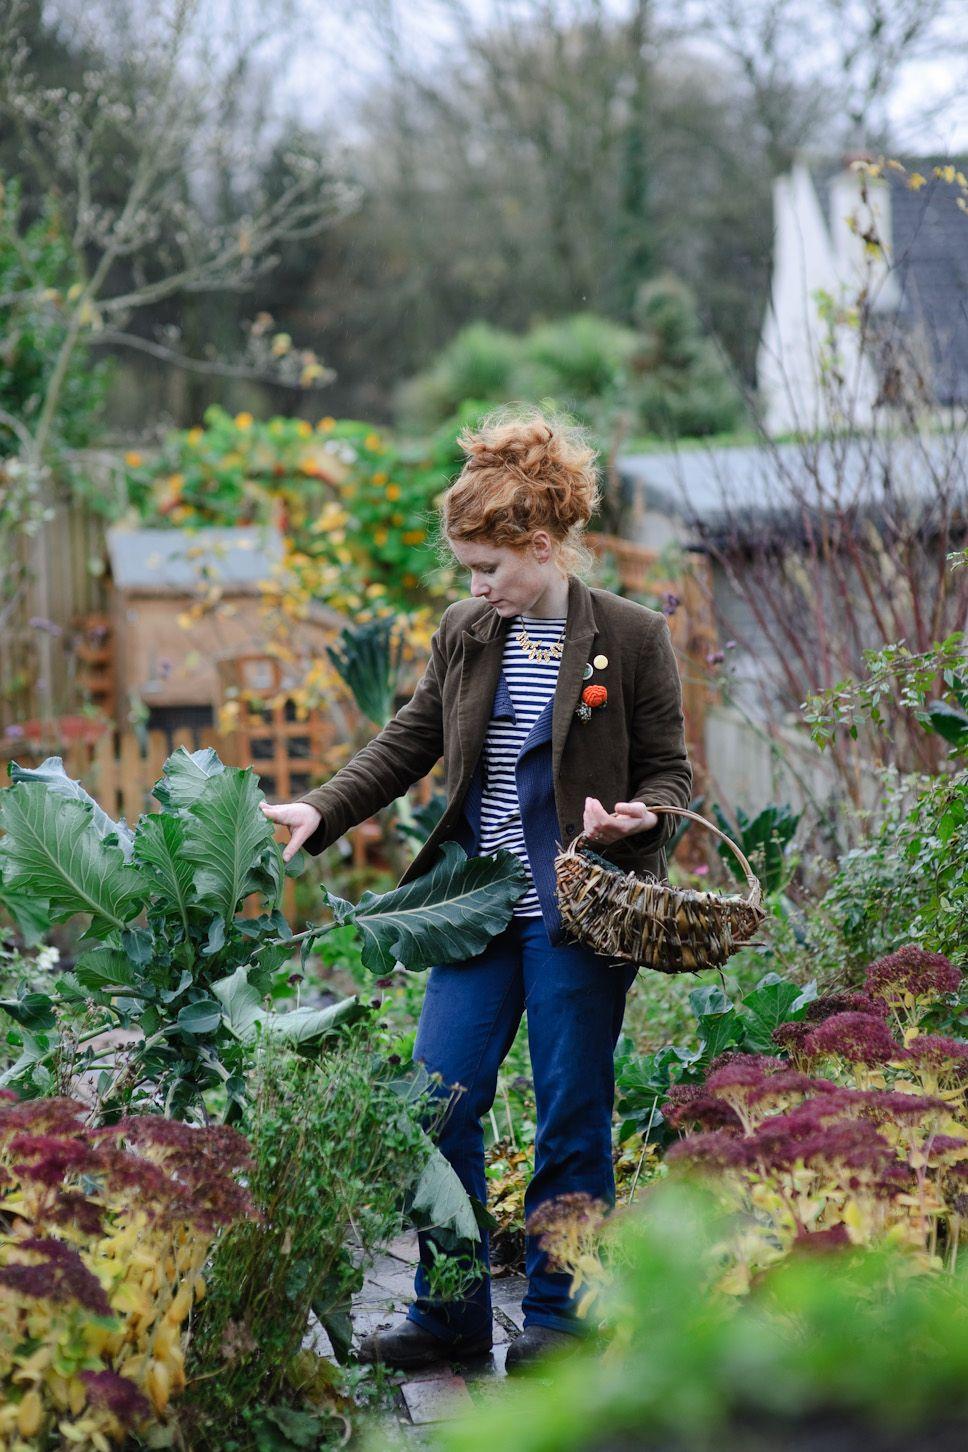 5fe4989f557c9f49dd85b6a932eef723 - How To Be A Gardener Bbc